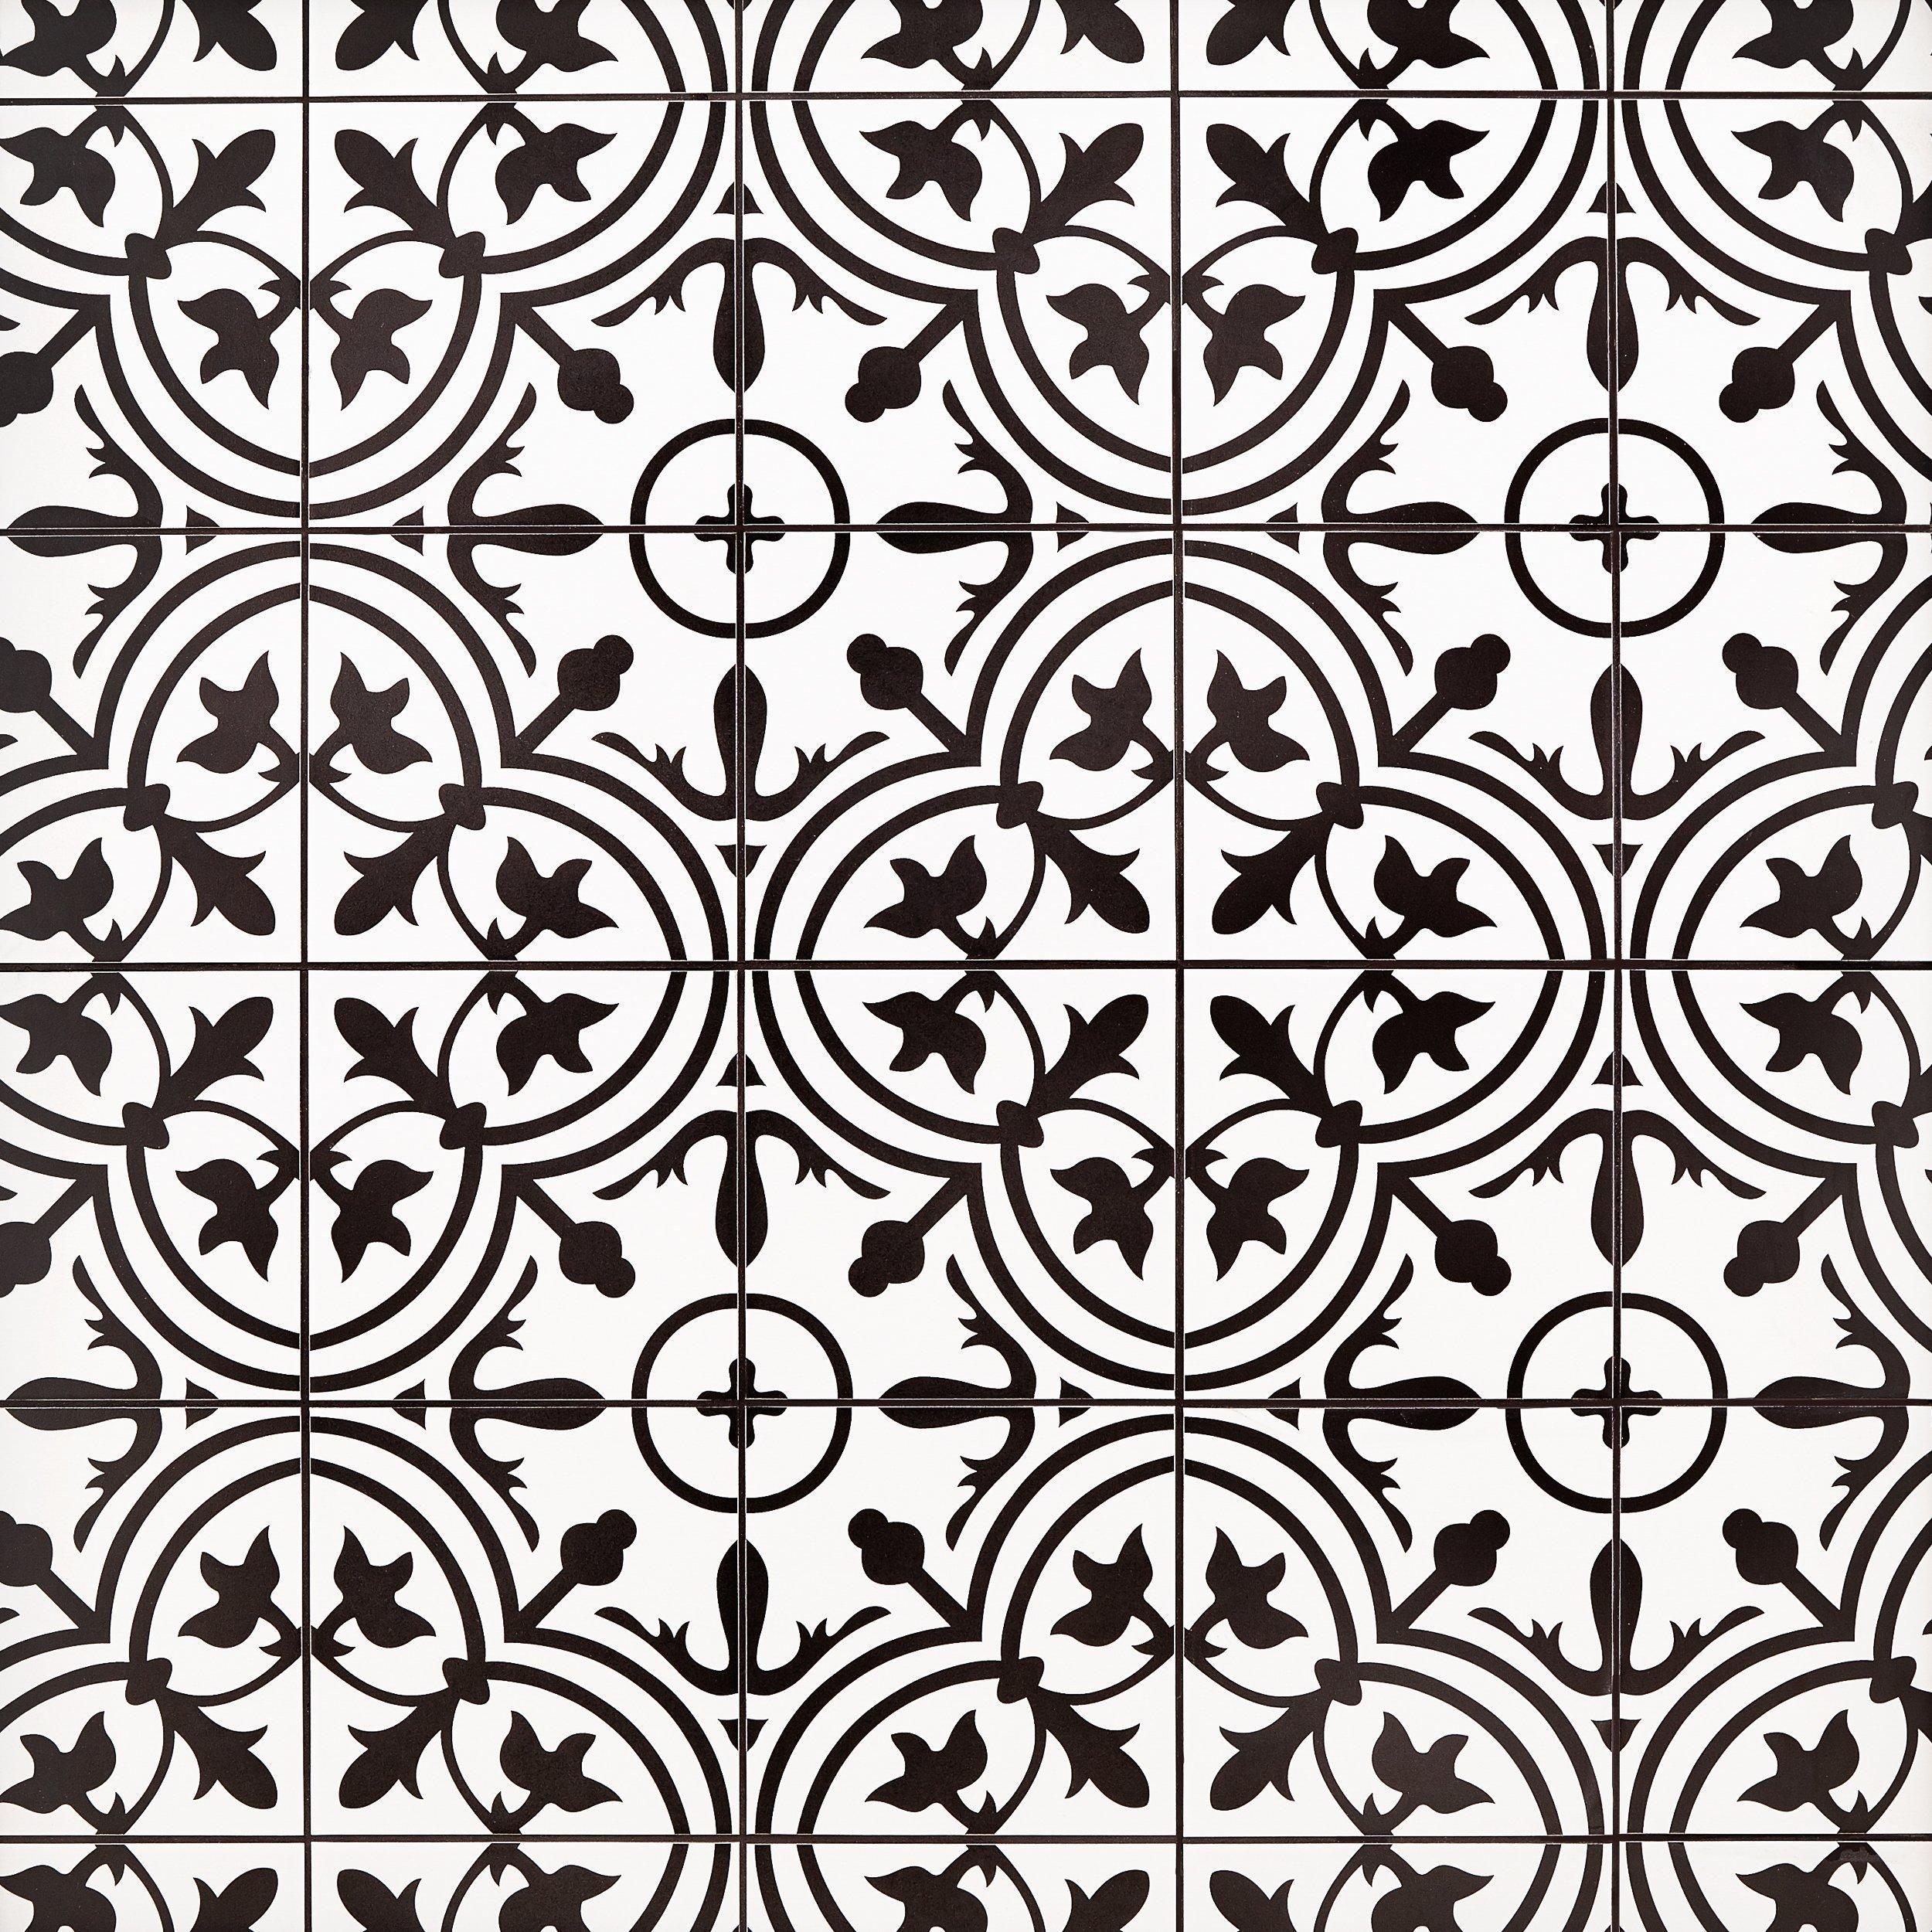 Bayona Decorative Ceramic Tile Decorative Ceramic Tile Ceramic Tiles Flooring